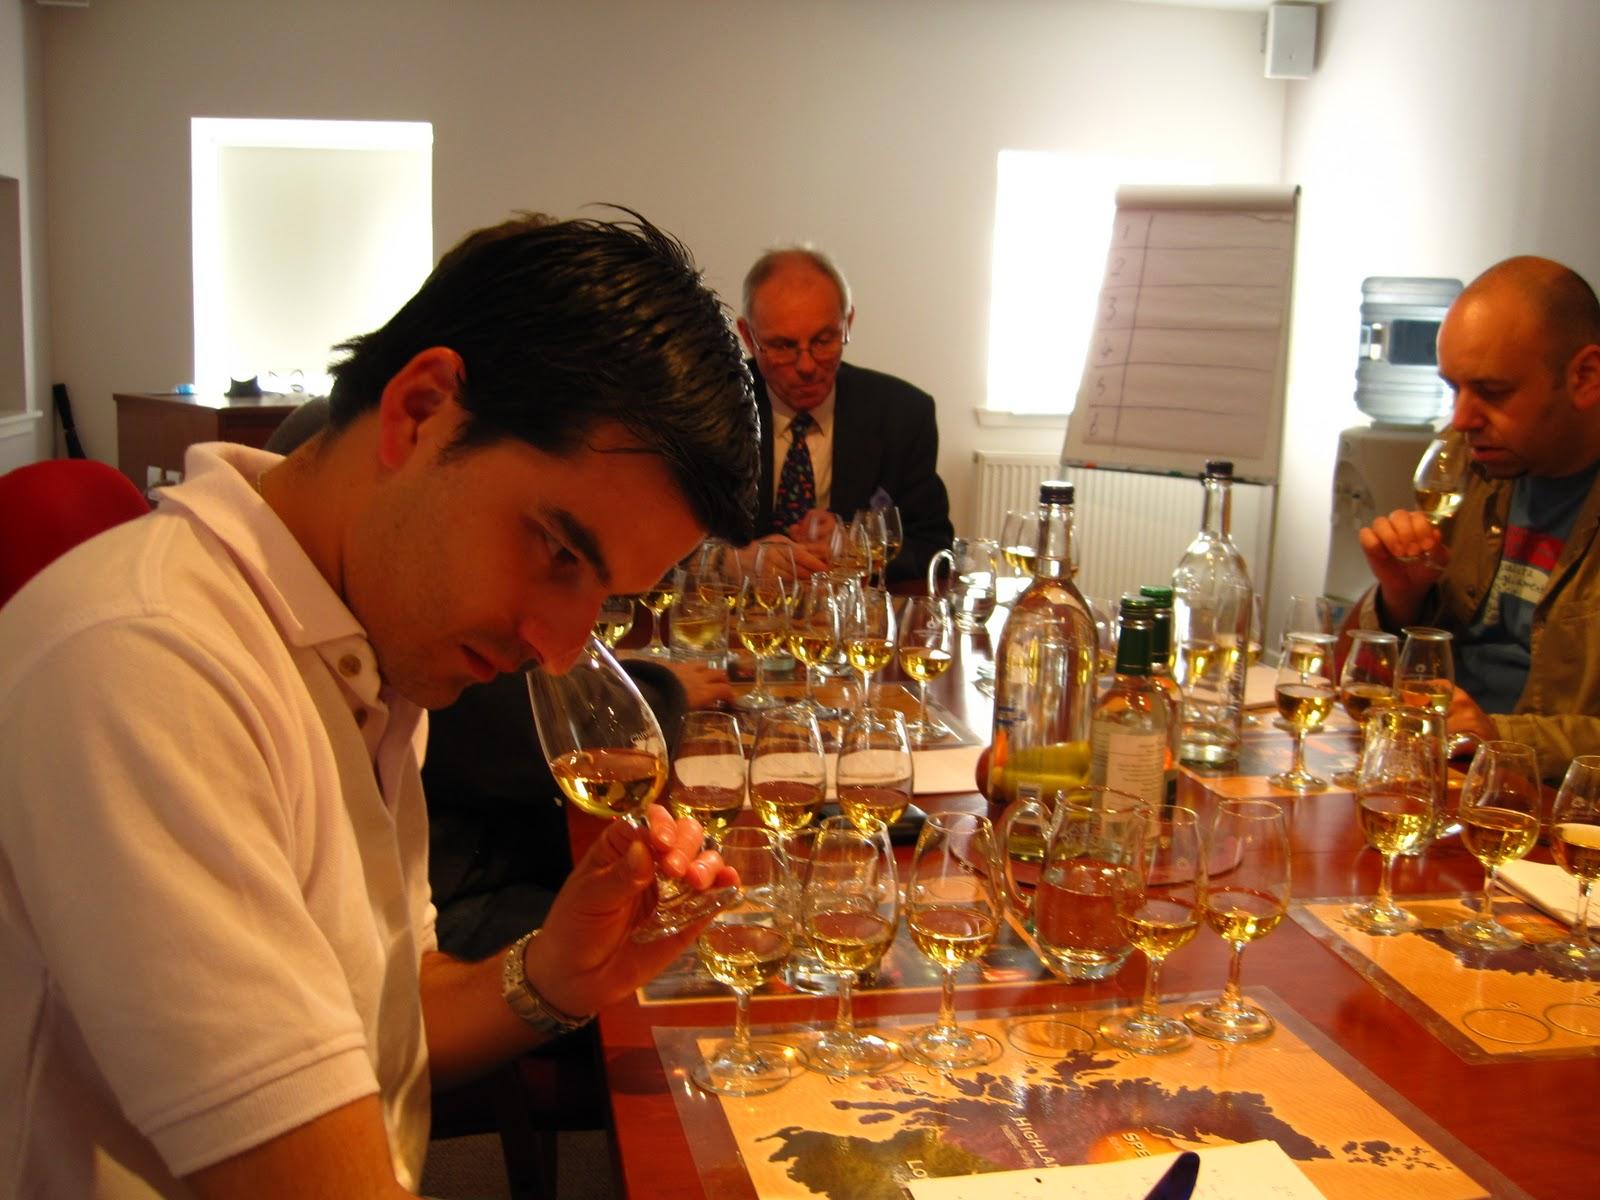 Mundo whisky aprendiendo a catar whiskies for Copas para whisky